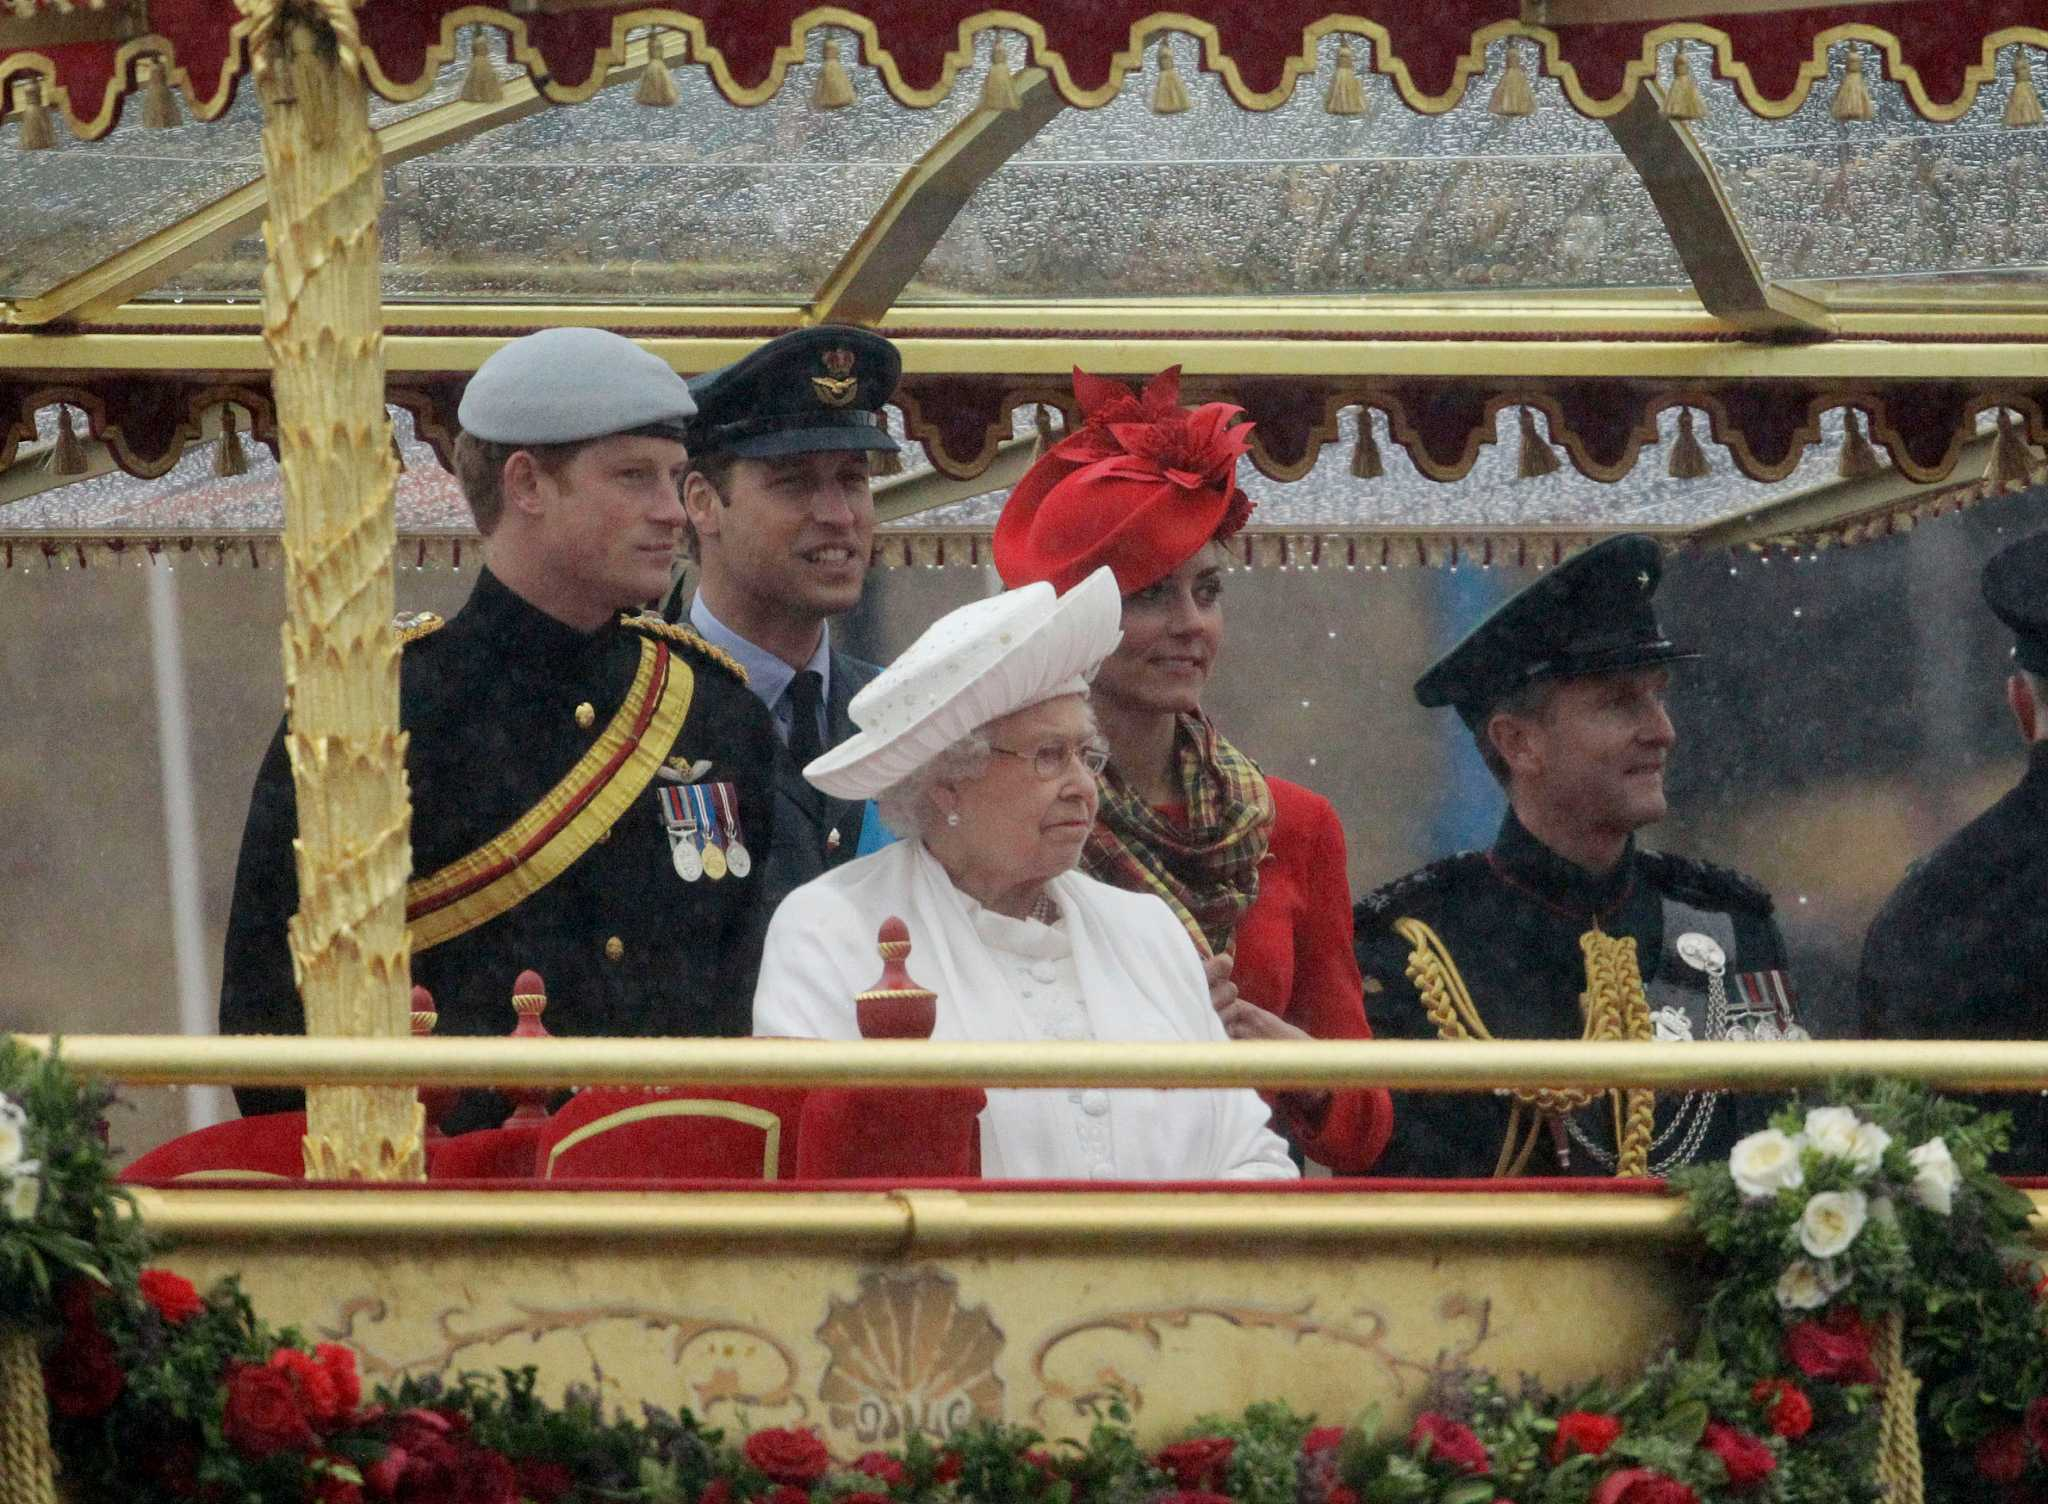 Flotilla Salutes Diamond Jubilee For Queen Elizabeth Ii